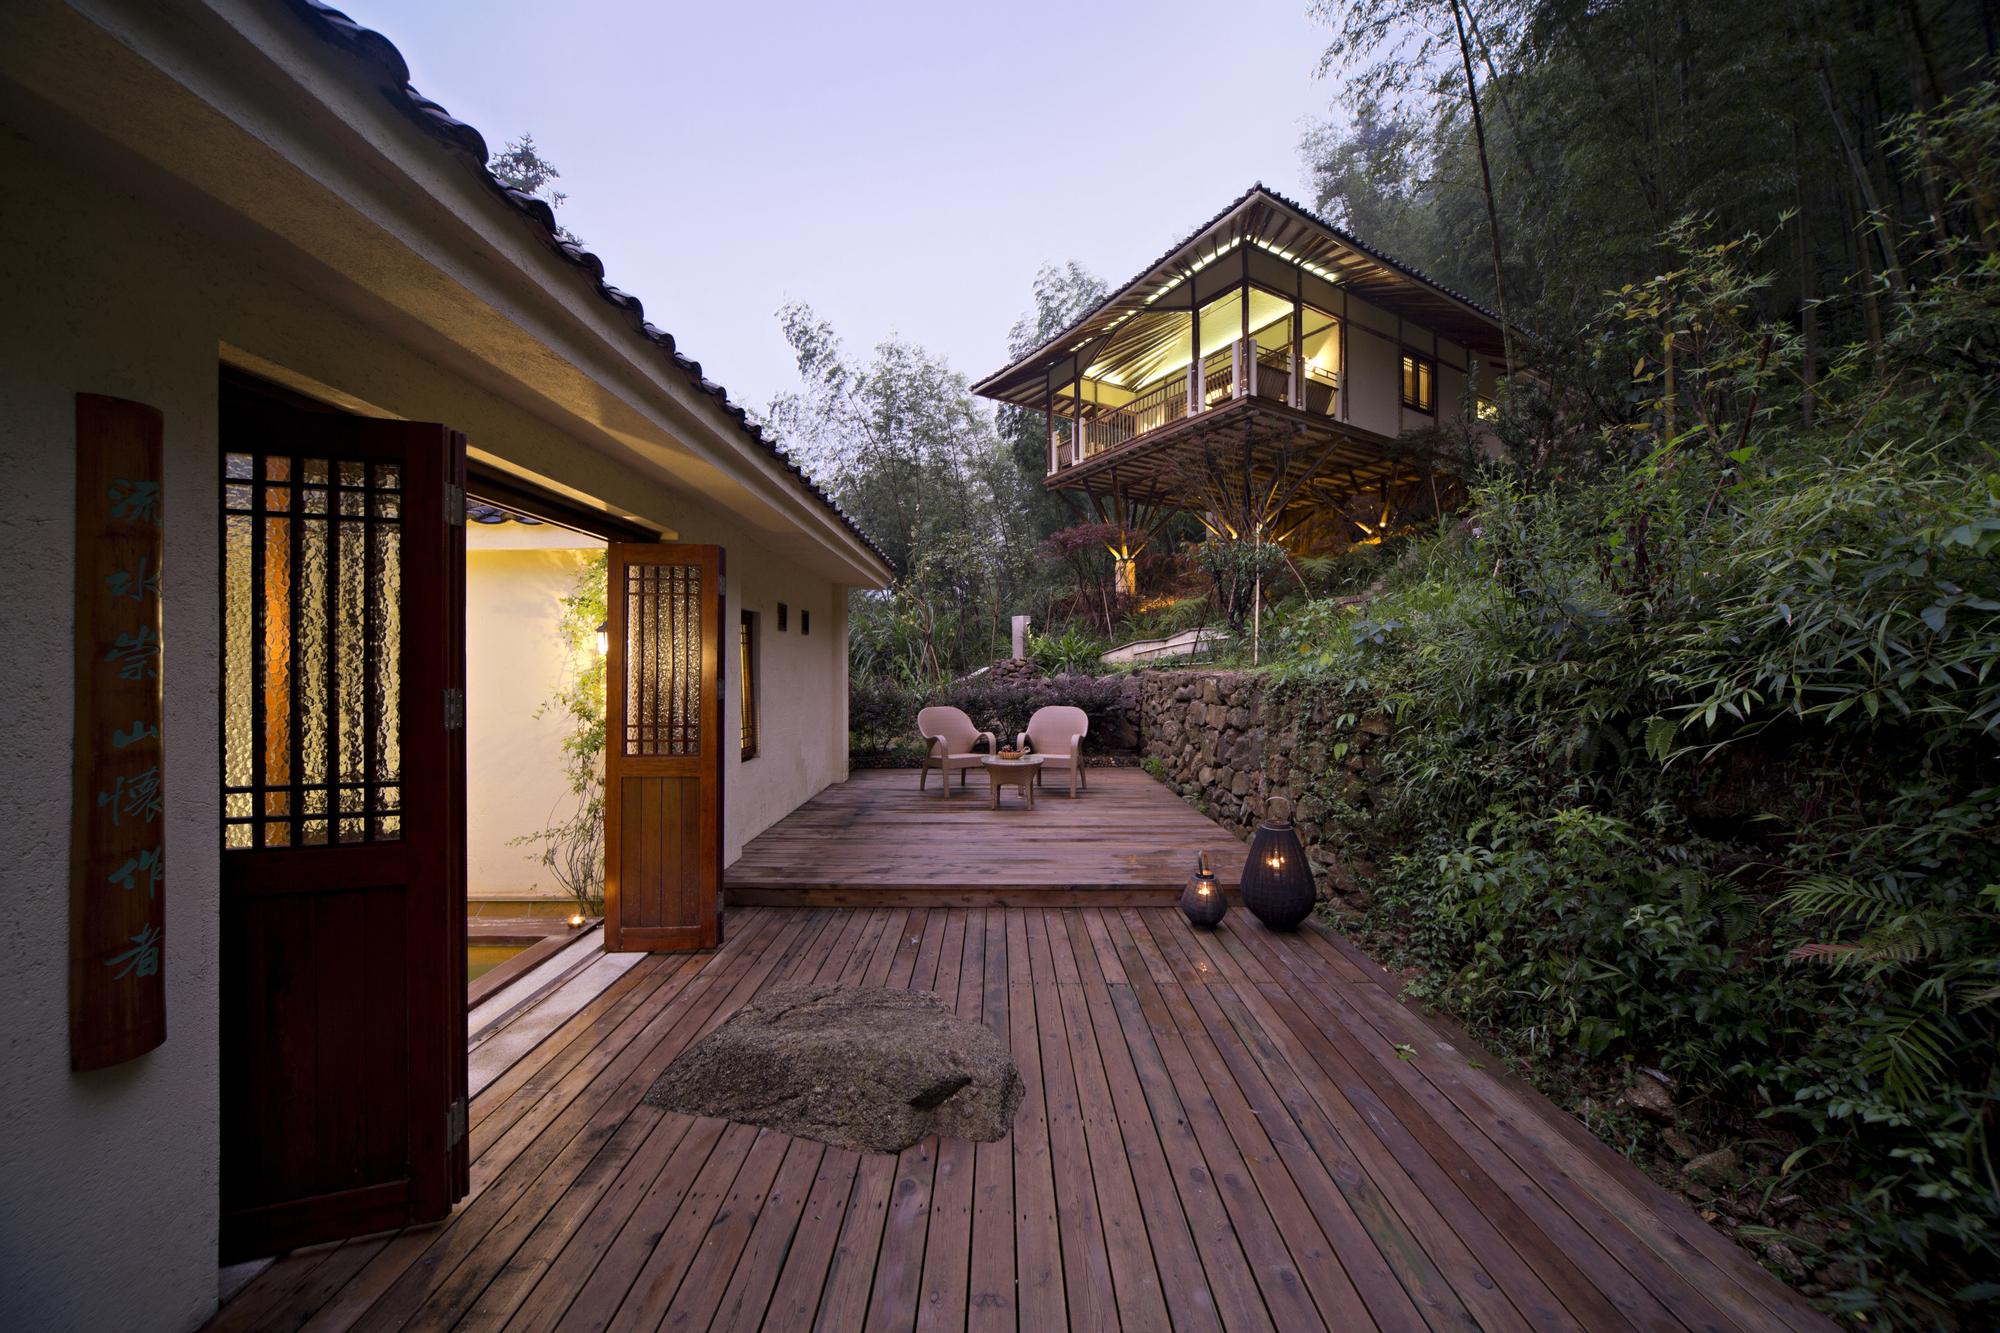 Bamboo Villa: Live in the Nature / C&C DESIGN